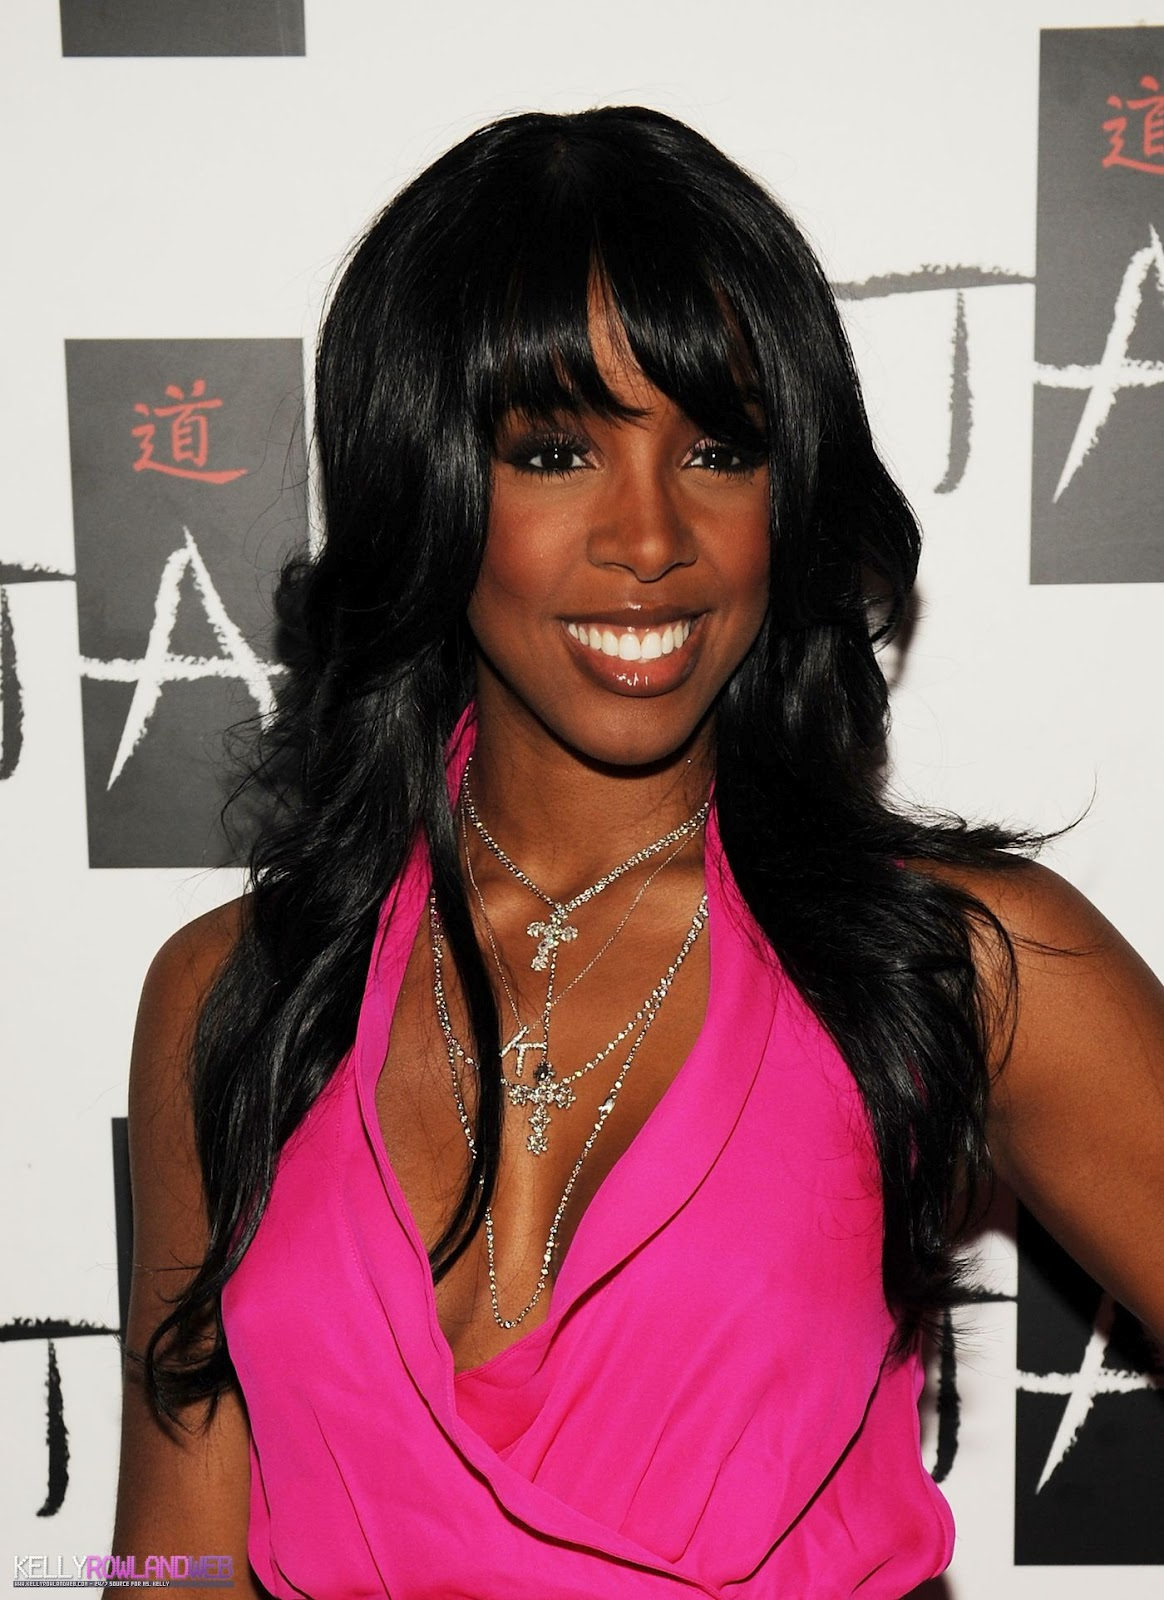 http://4.bp.blogspot.com/-fzDJTL_kyKo/UB2J5iLIdkI/AAAAAAAAFQI/HtEZPa7WJIw/s1600/Kelly-Rowland-hairstyle-pictures-singer-actress-celebrity-on%2Band%2Bon-Kelly-Rowlands-wallpapers%2B(11).jpg